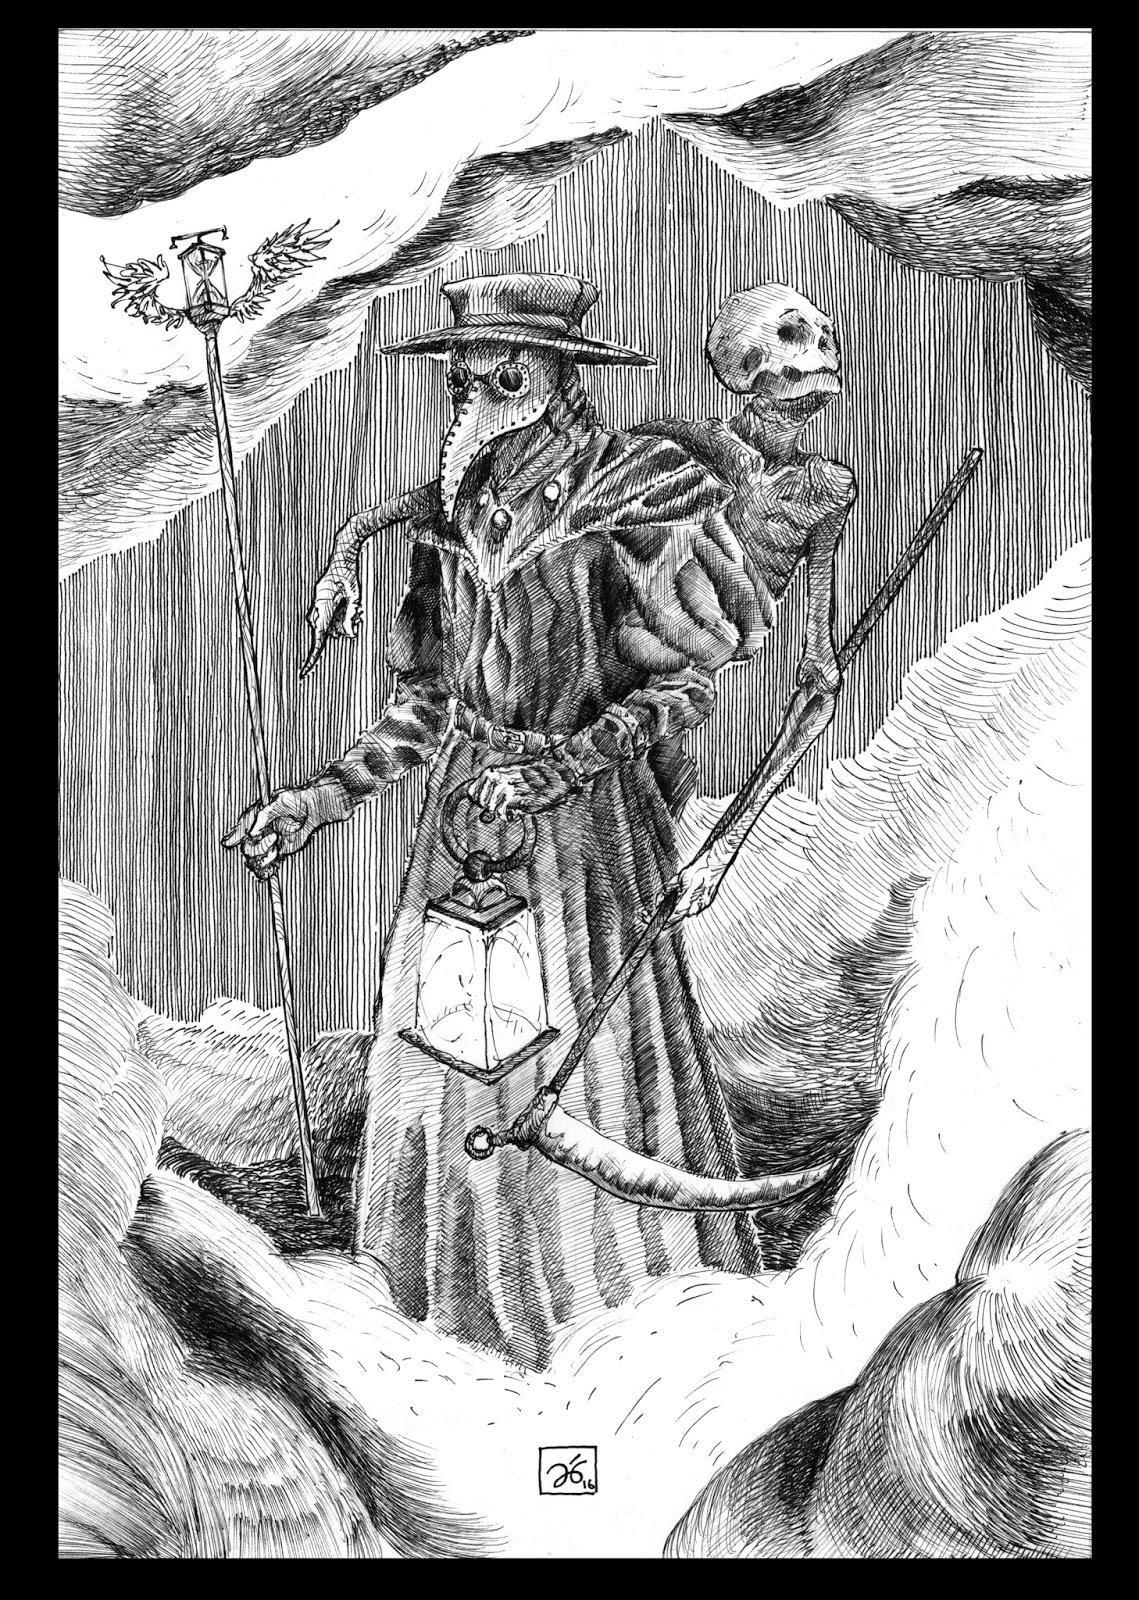 Black And White Wallpaper Designs Victor Doblege M 233 Dico Medieval Doctor De La Peste 01 02 16